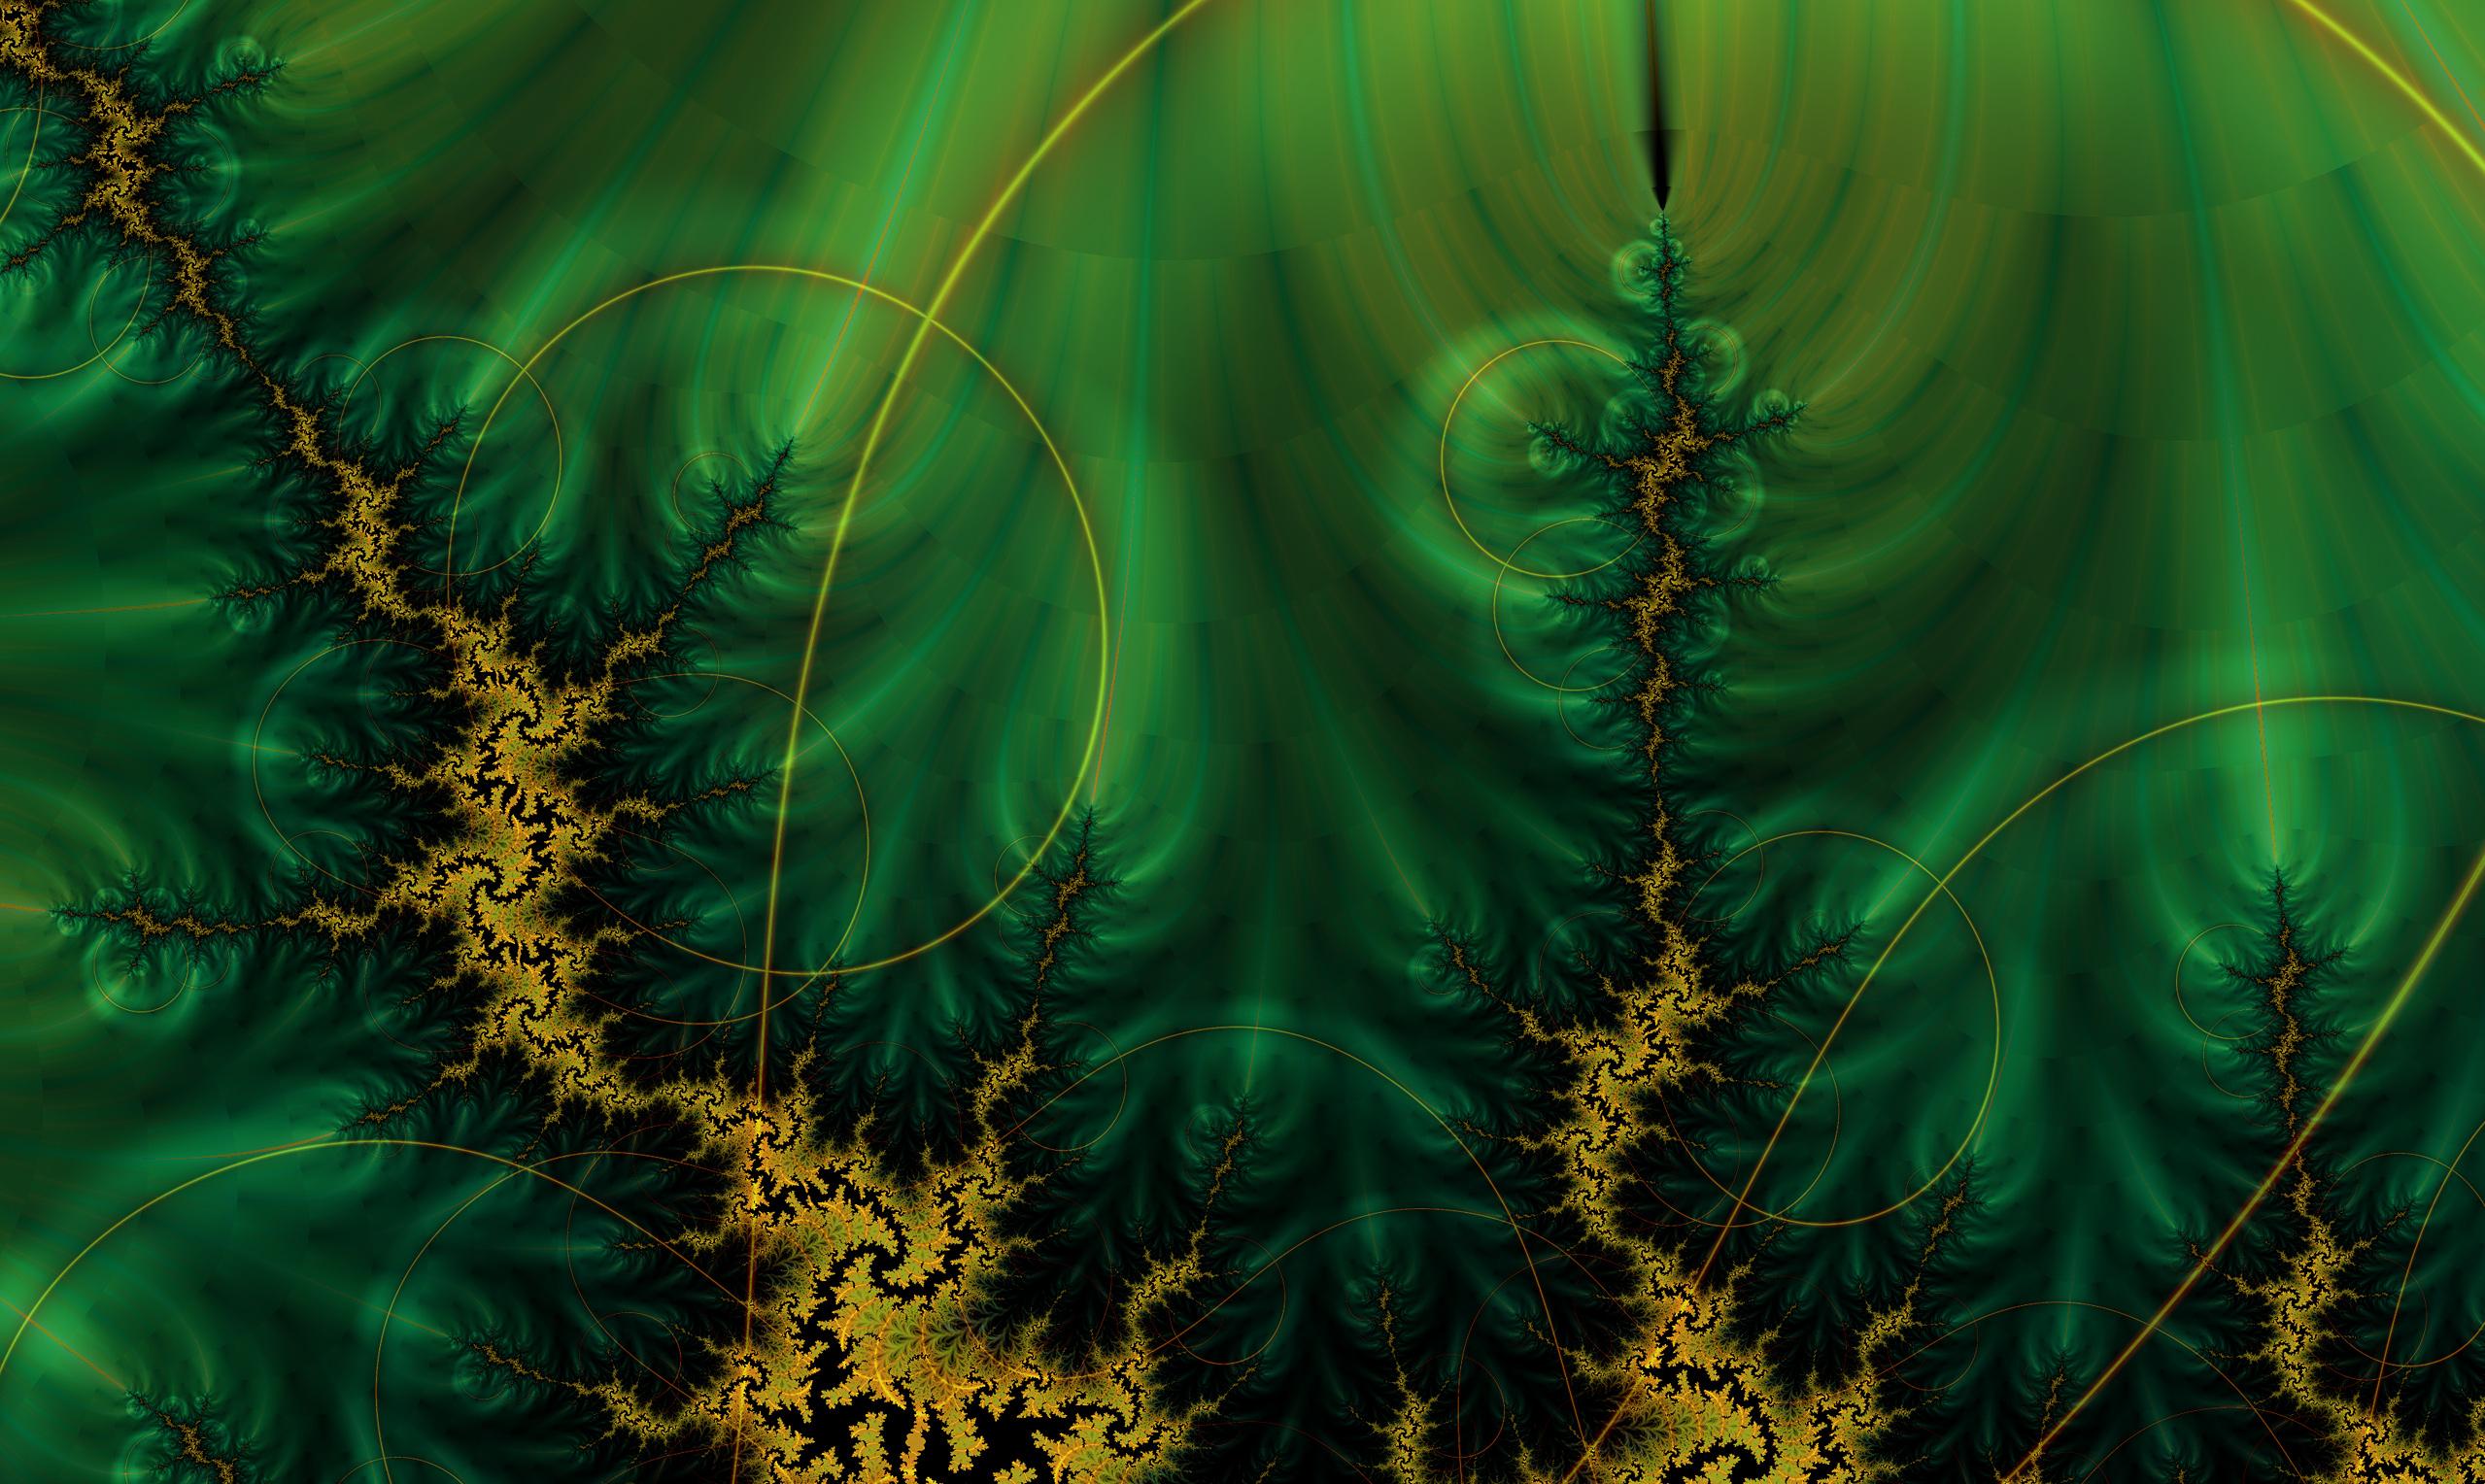 fractal wallpaper background 2558x1528